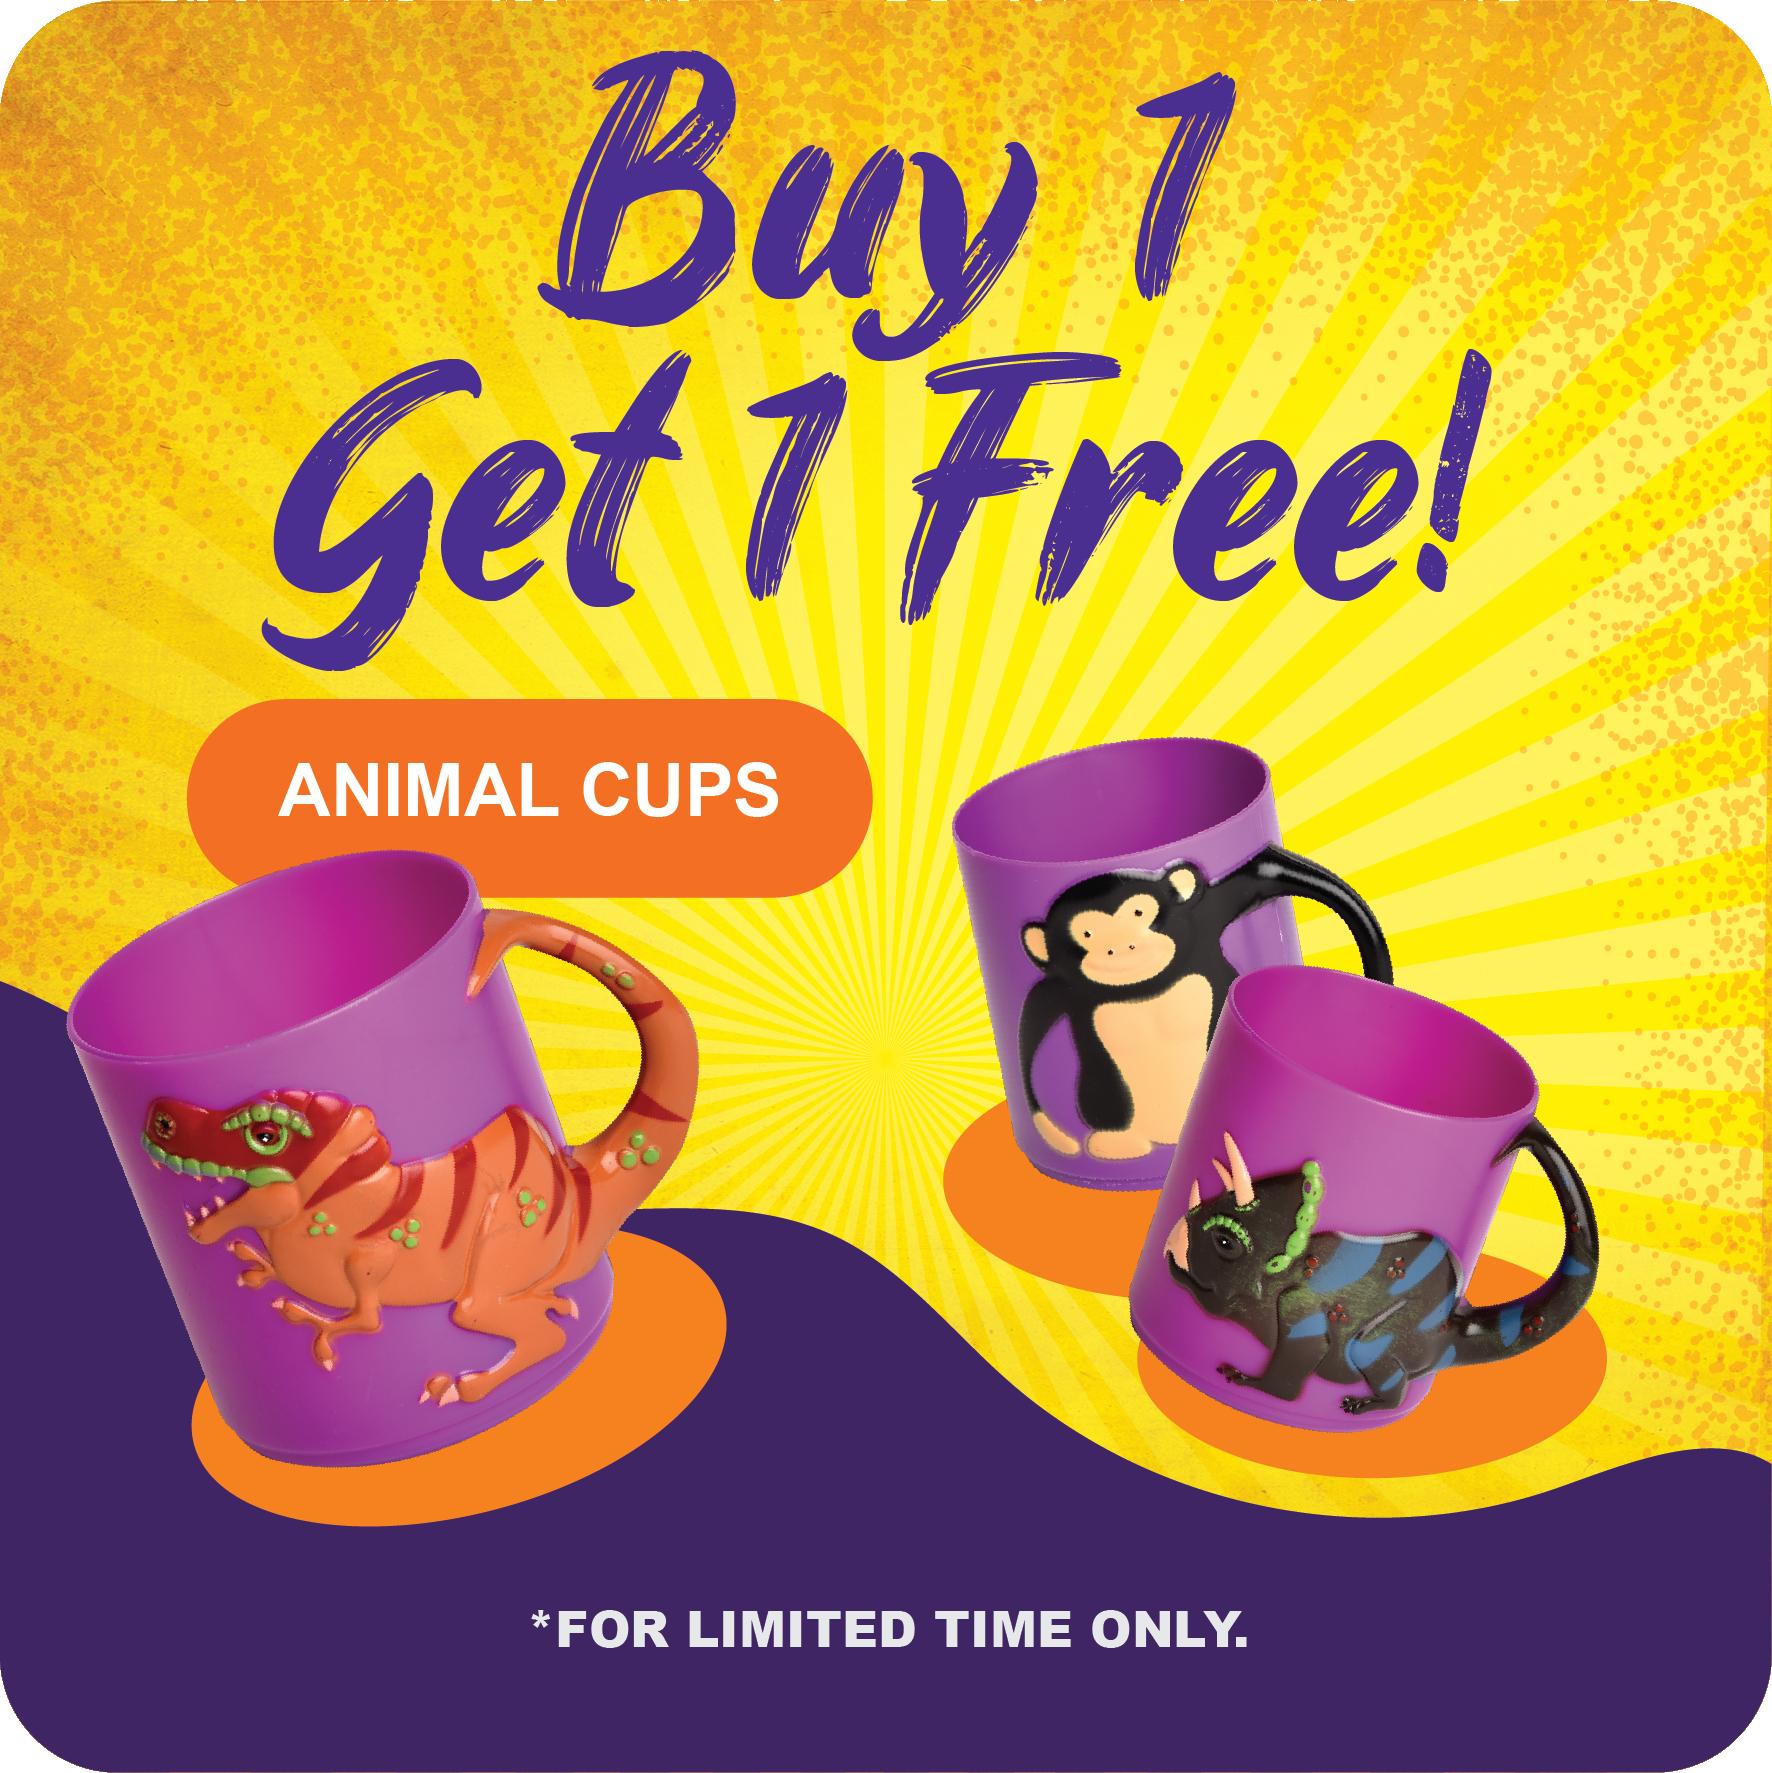 Curiosity Shop June Promotion - Animal Cup